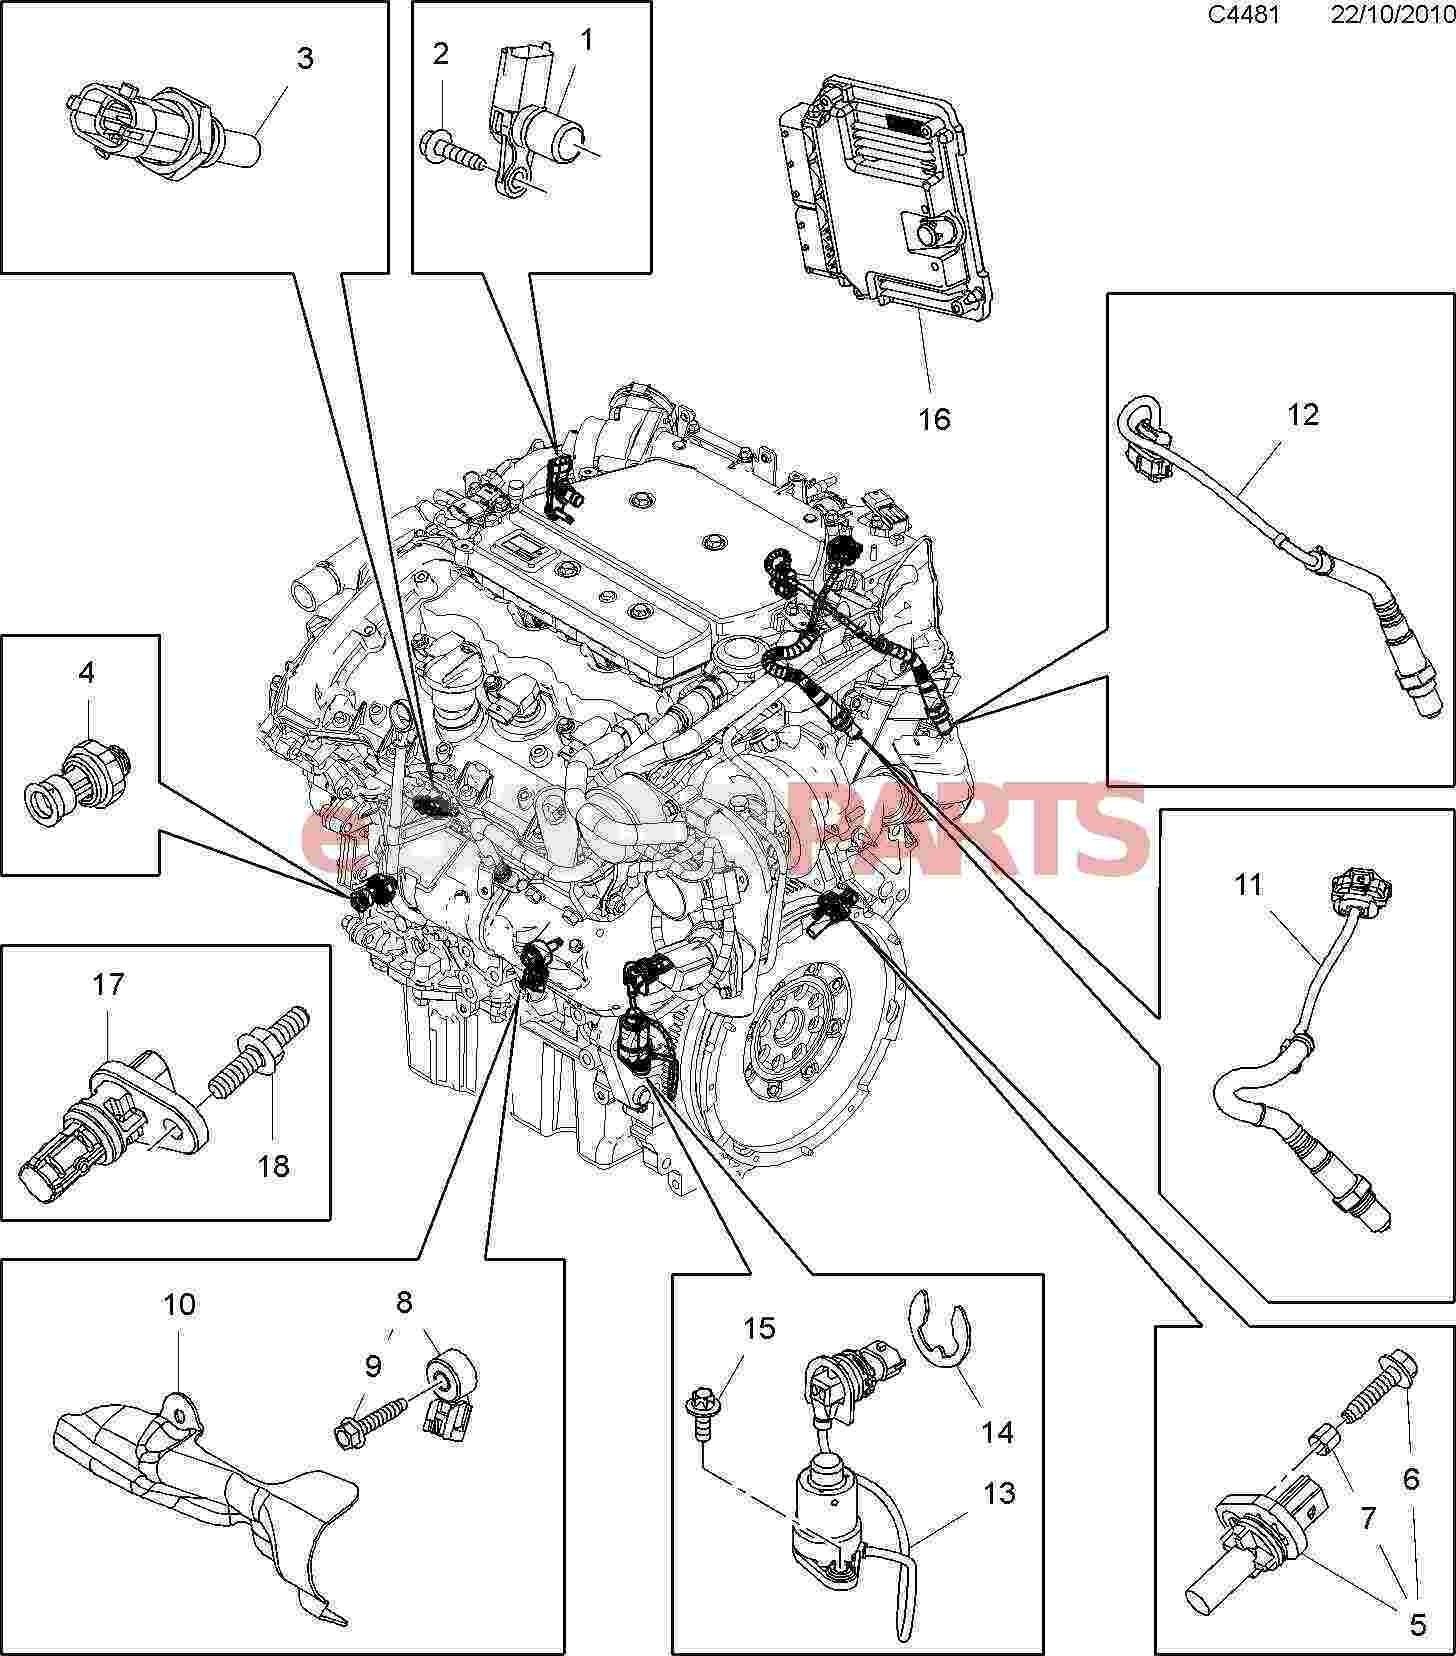 1999 saab 9 3 engine diagram - wiring diagram 98 subaru legacy -  source-auto4.tukune.jeanjaures37.fr  wiring diagram resource